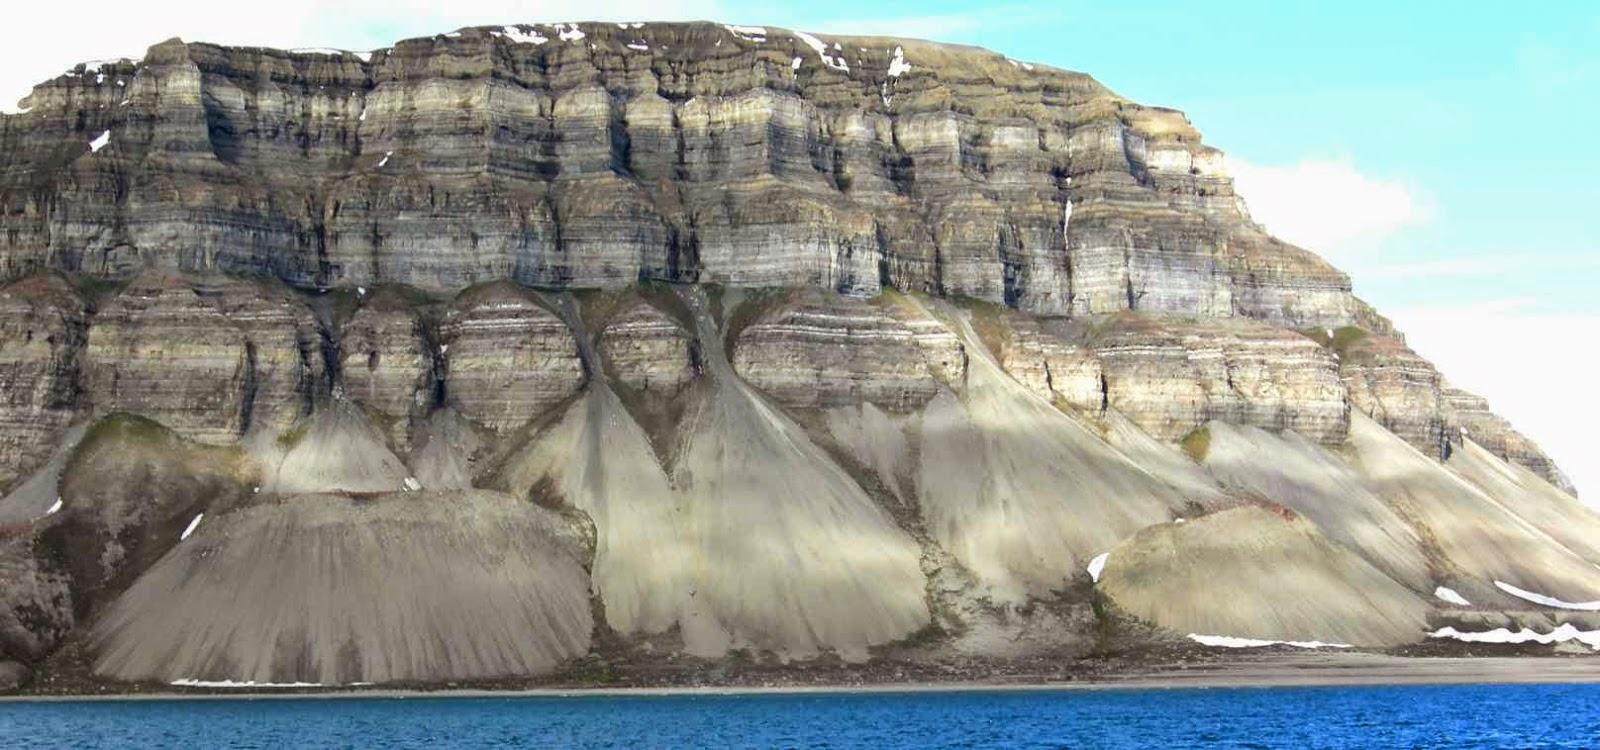 Paisaje de rocas sedimentarias